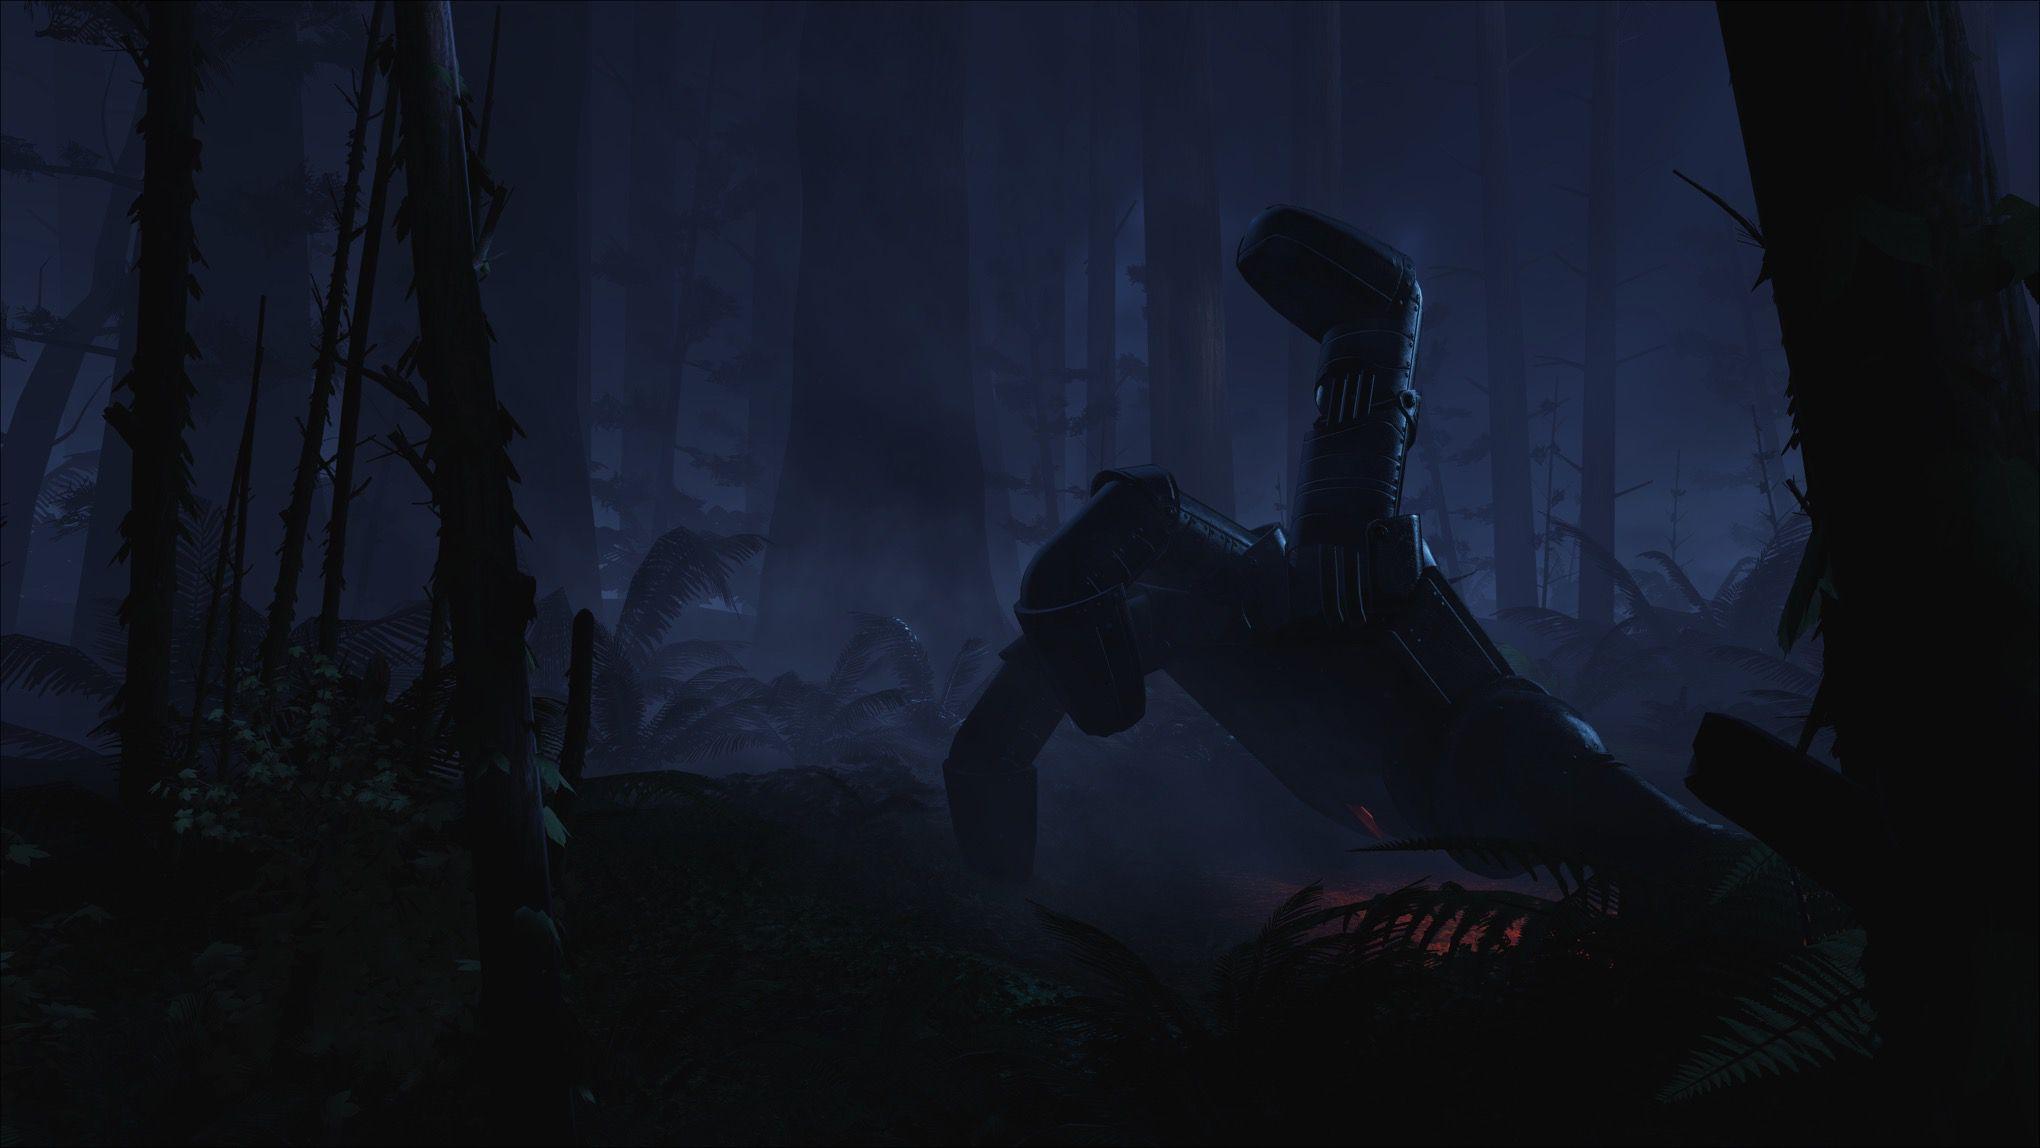 Lost screenshot (OCULUS)